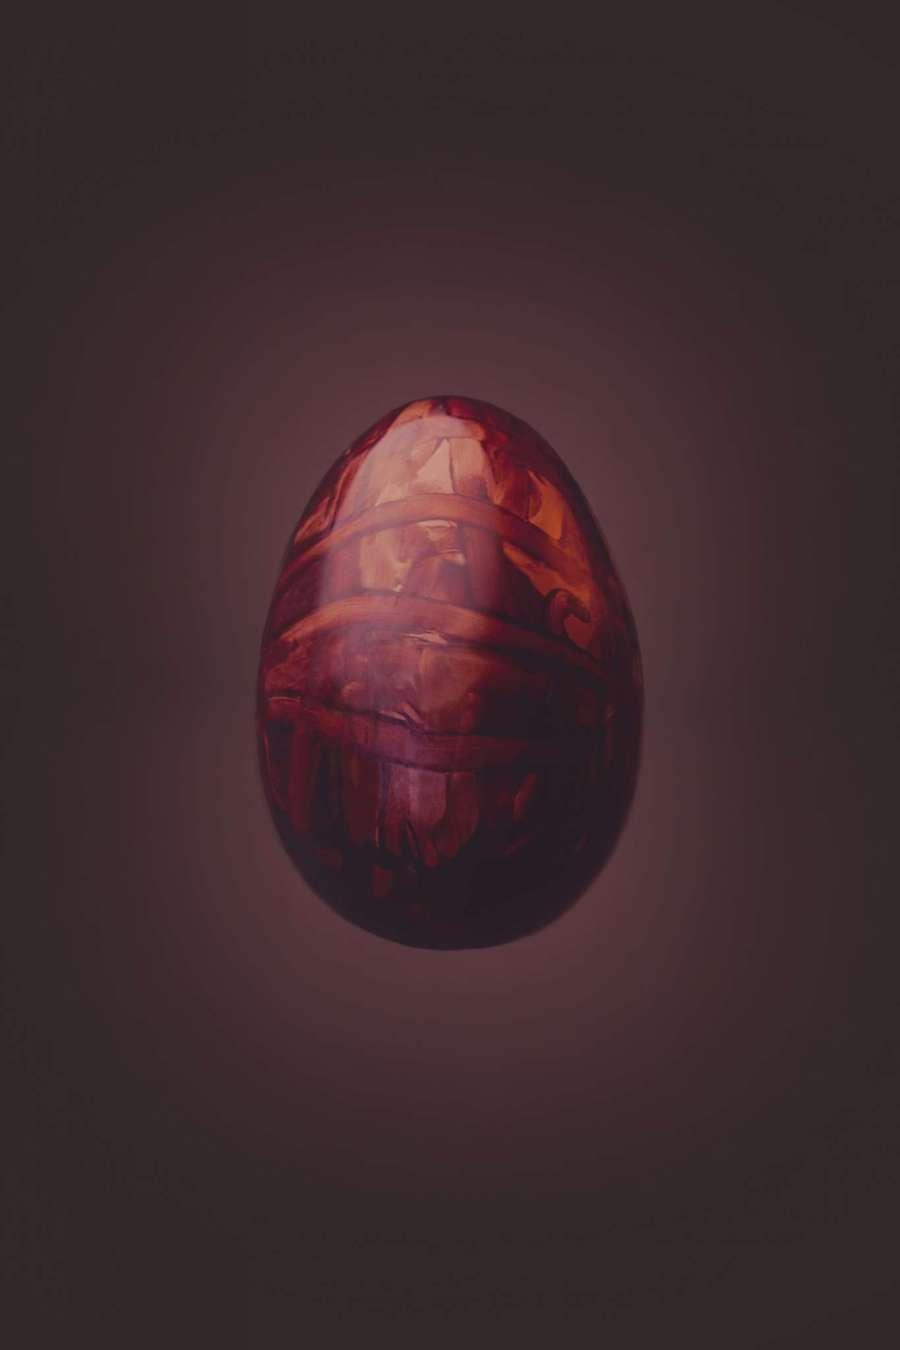 cocoa-amore-egg-final-magazine